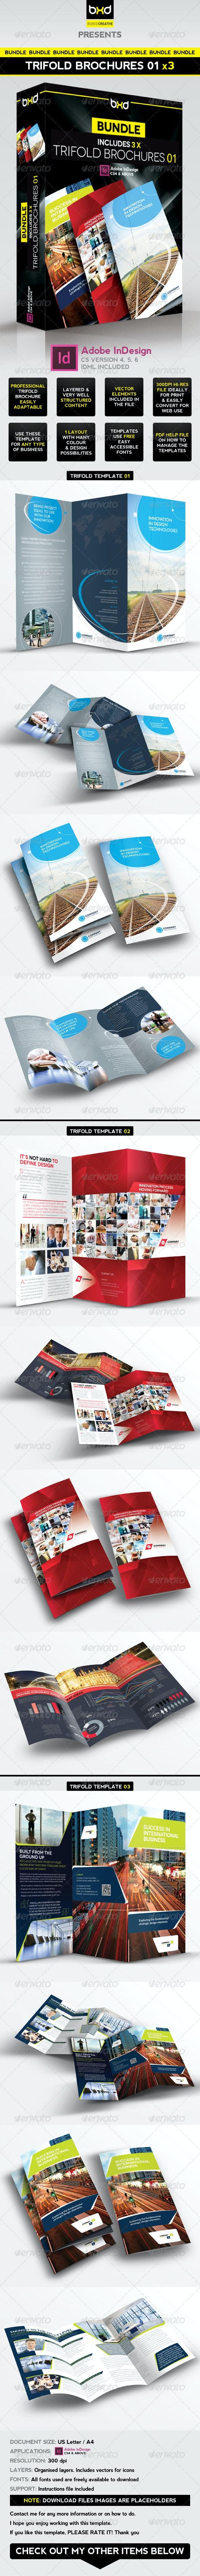 Trifold Brochures Bundle - InDesign Layout 01 - Corporate Brochures